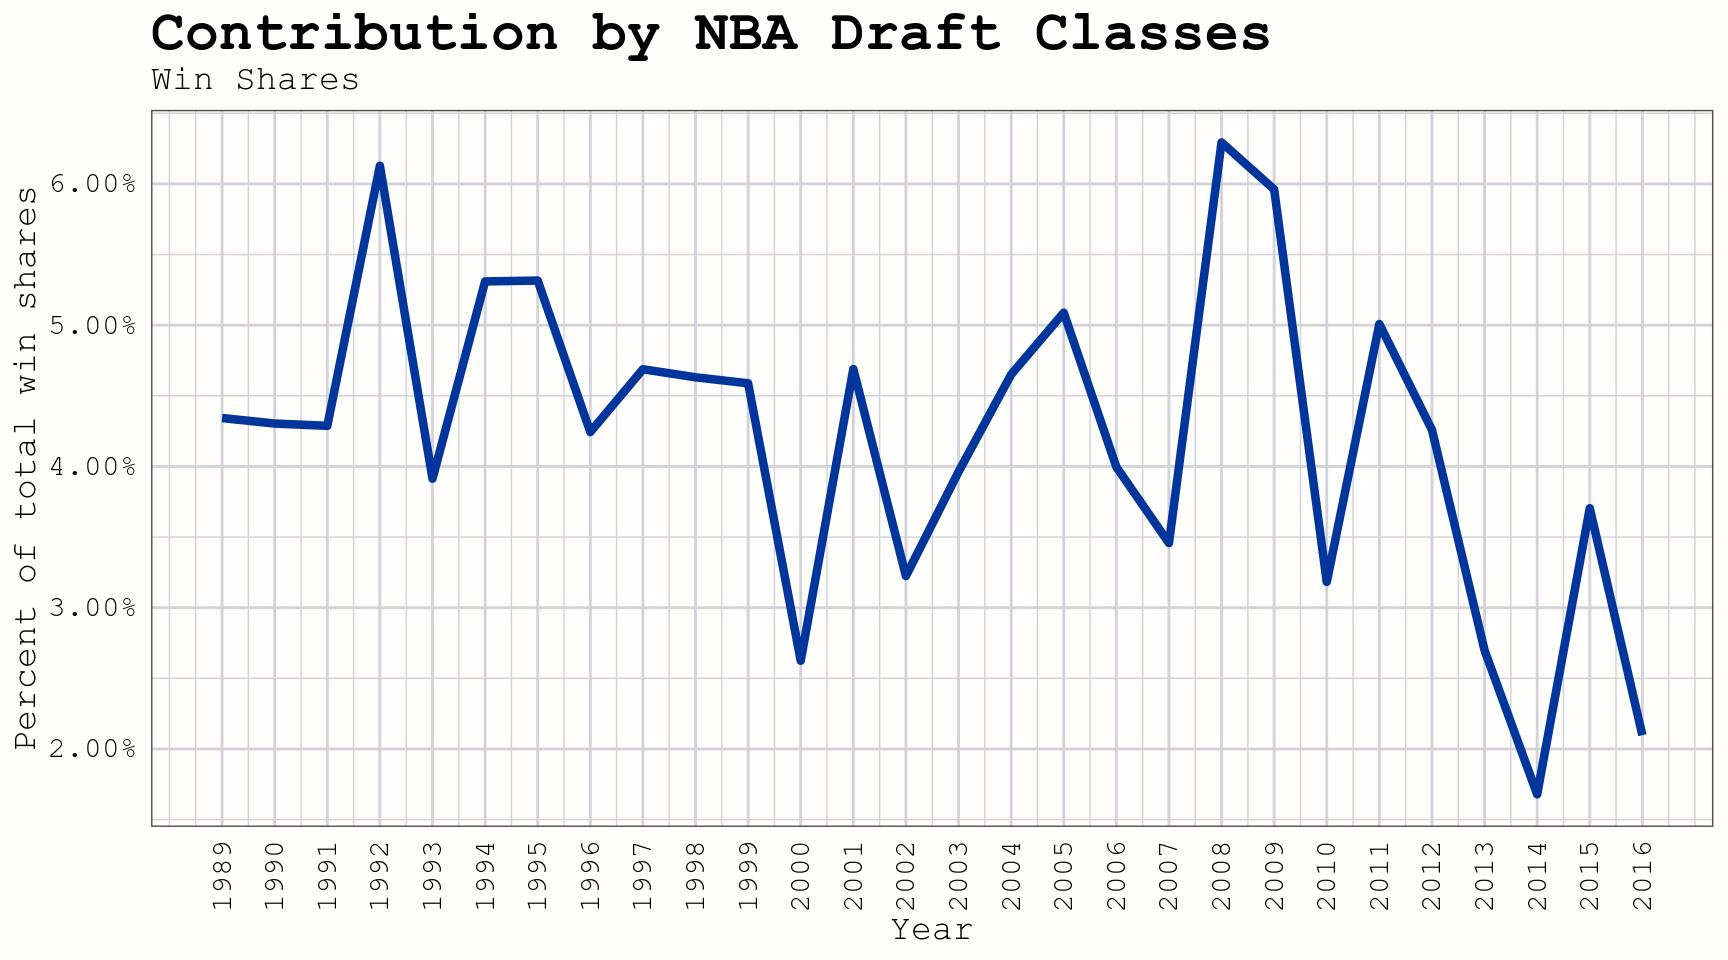 Comparing the Immediate Impact of NBA Draft Classes (1989